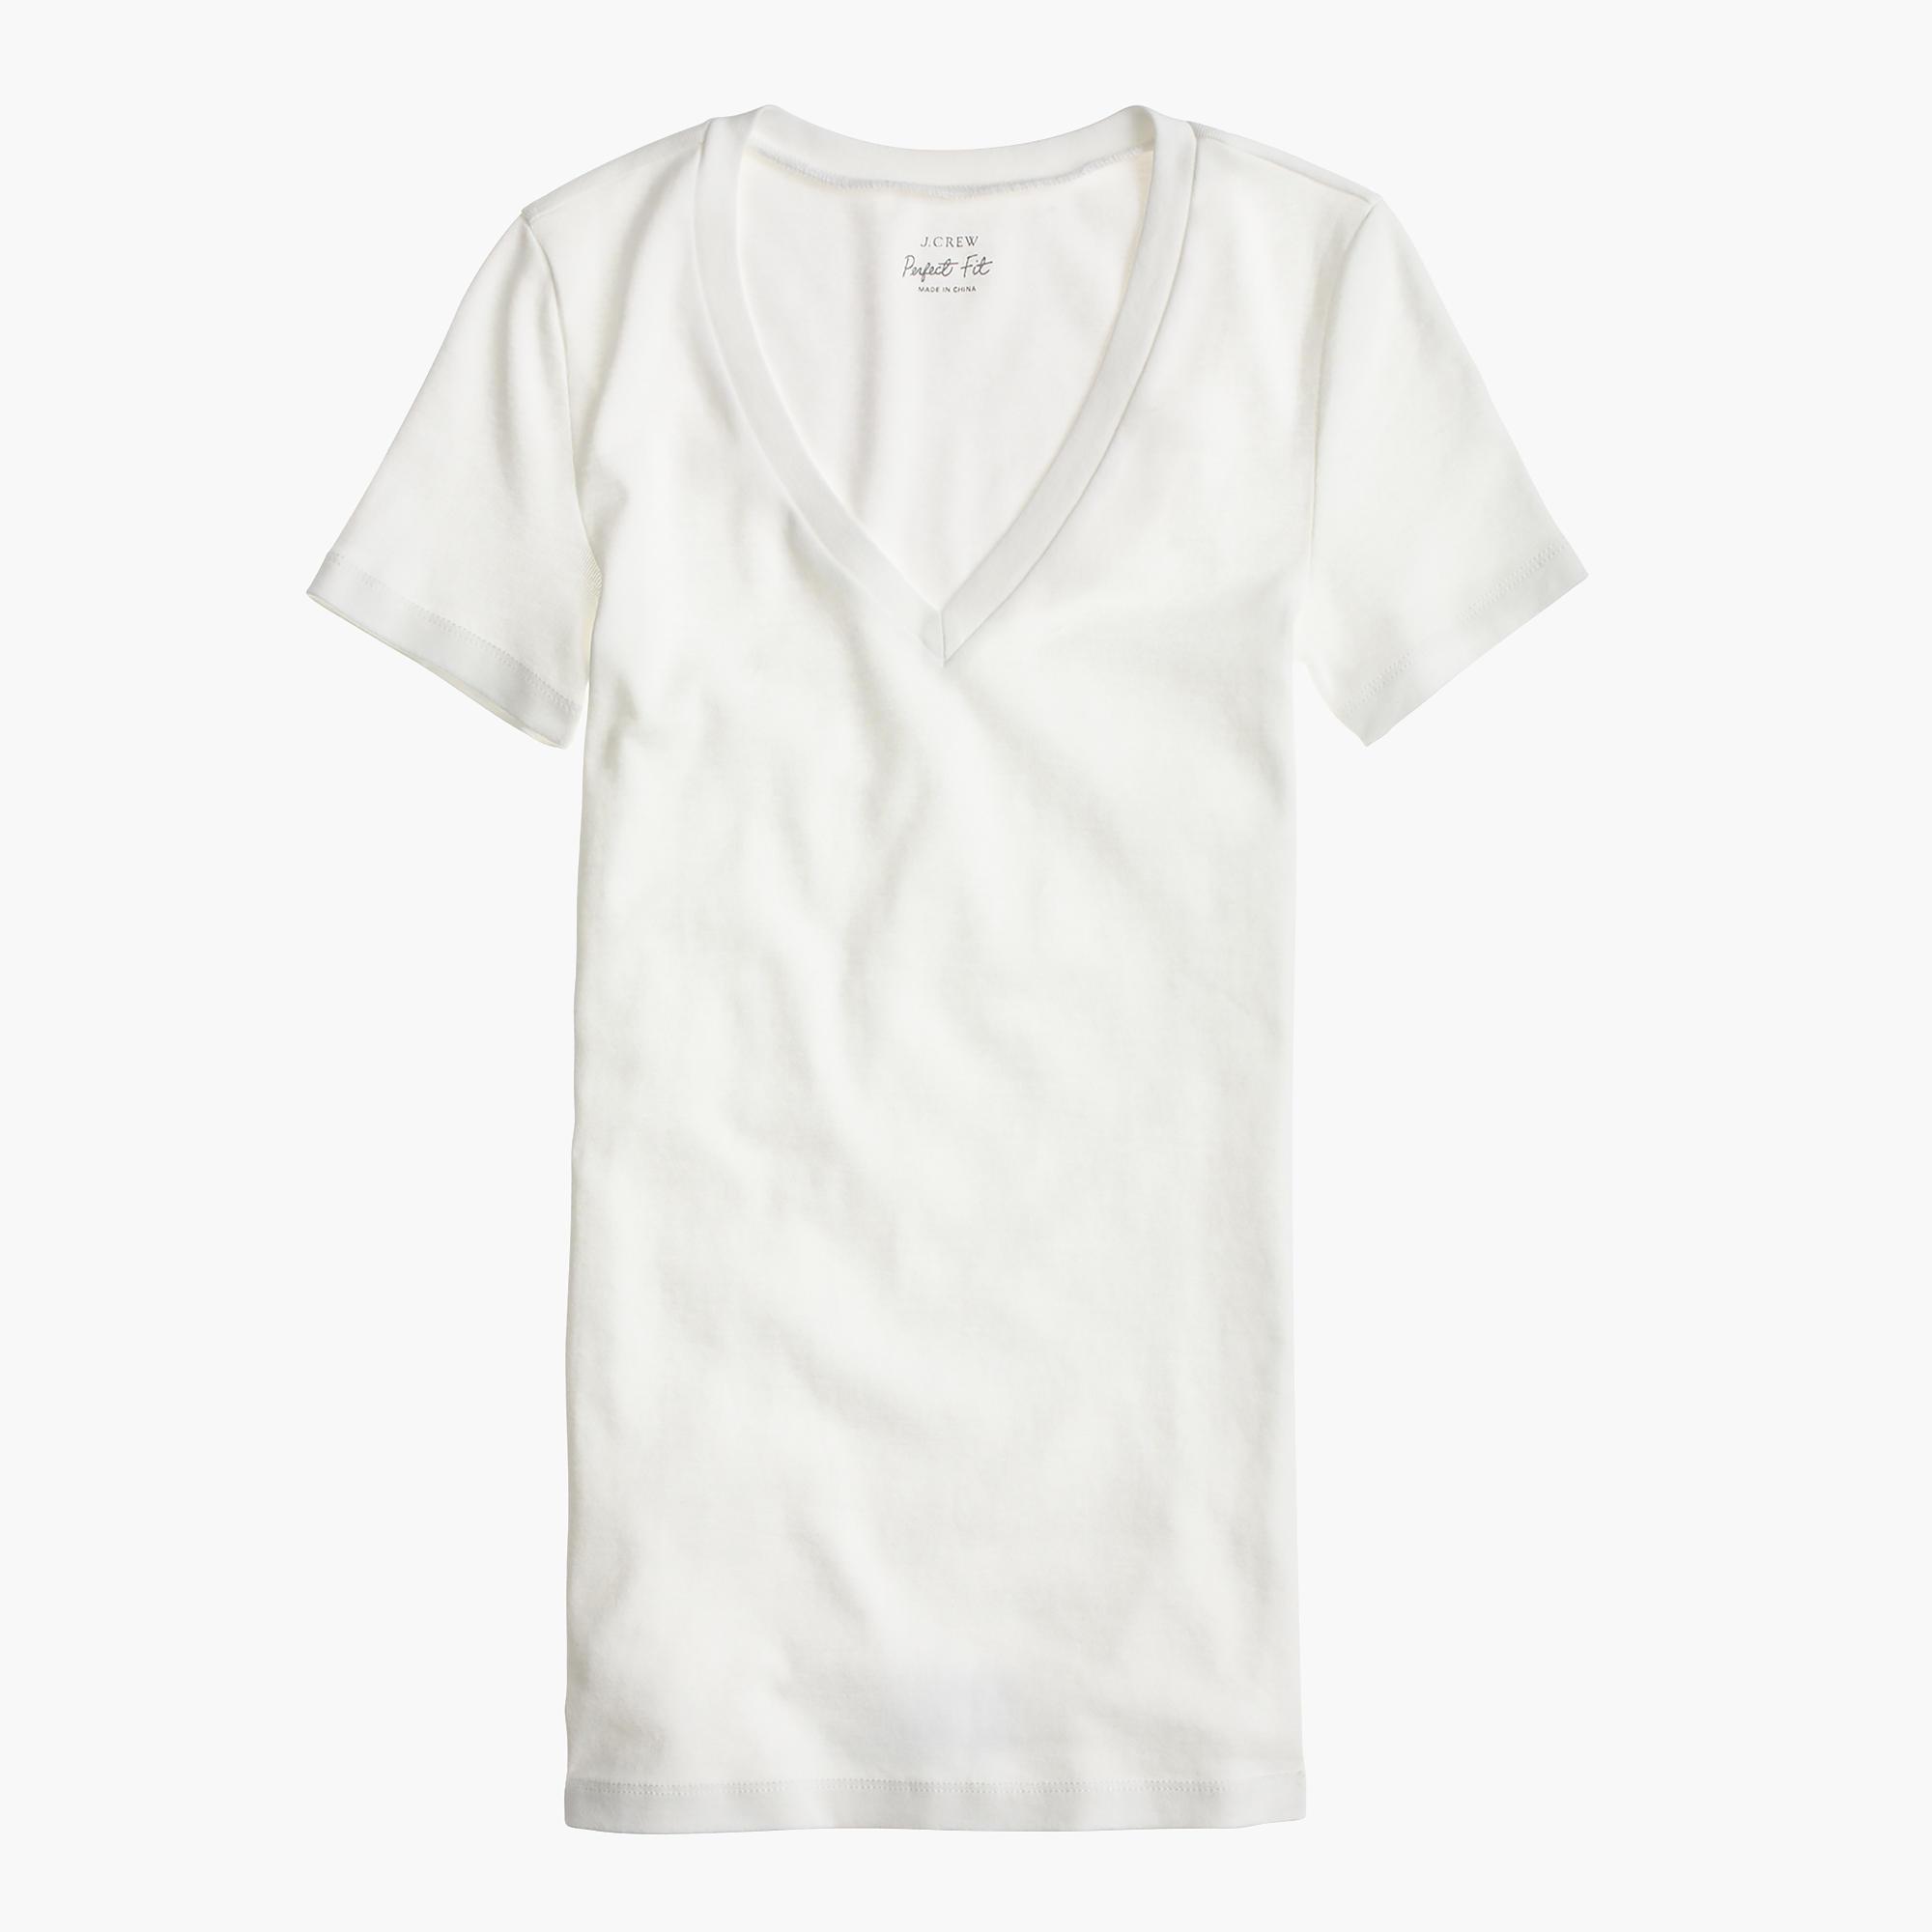 White t shirt artee shirt for Good white t shirts